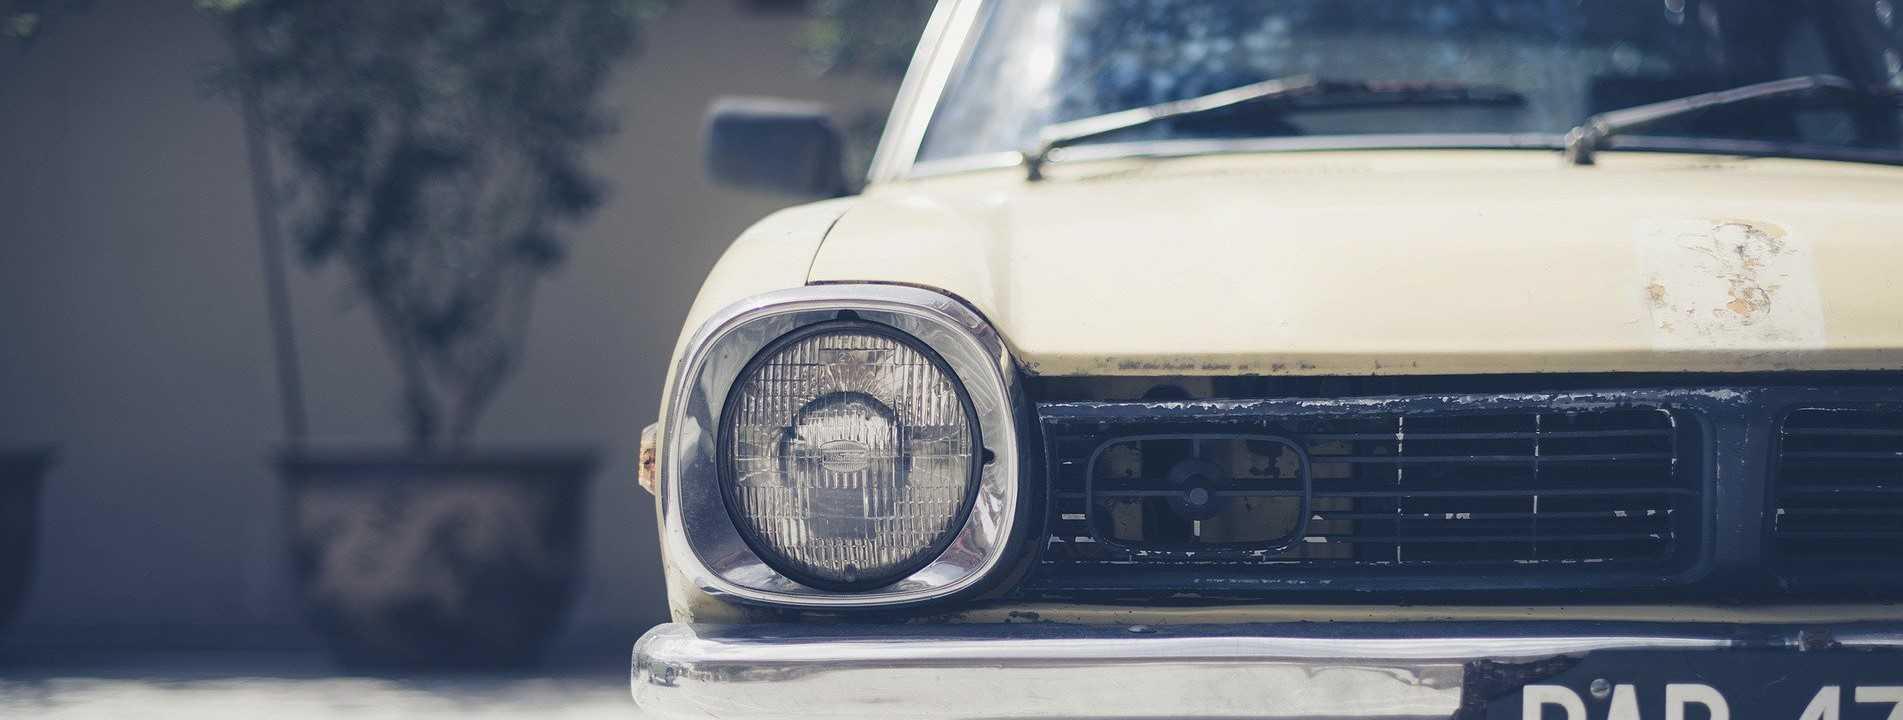 Oldtimer Car in Rochester, New York | Kids Car Donations